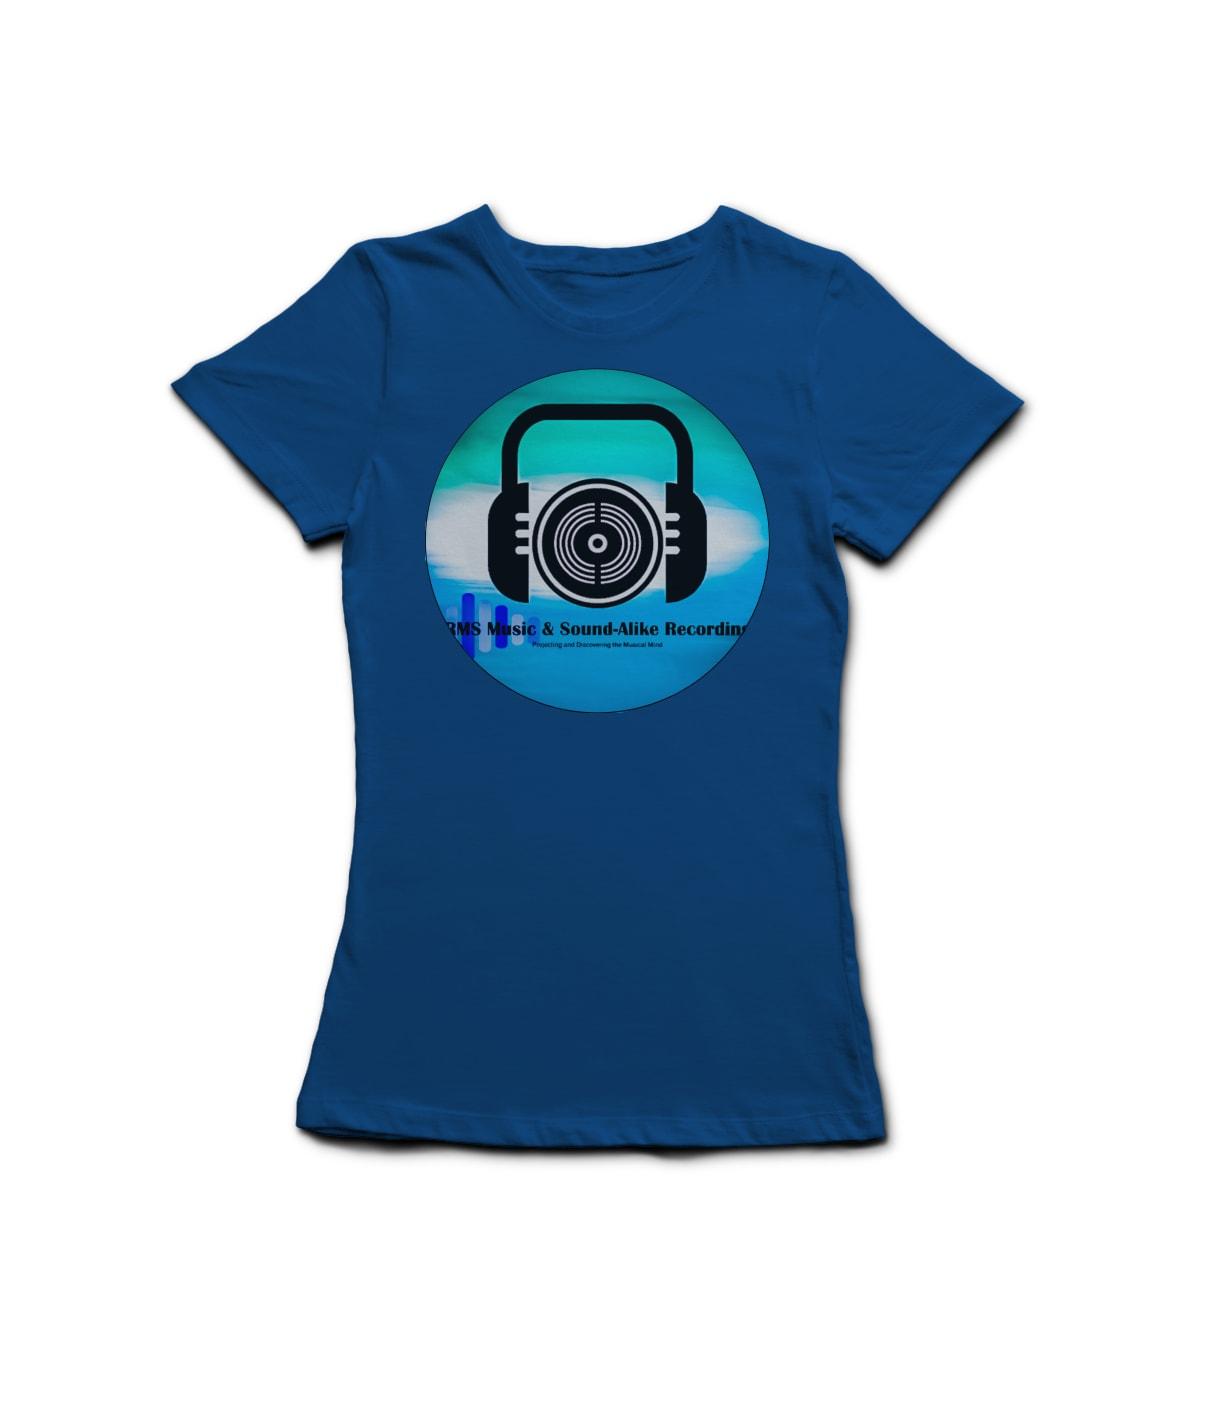 L t shirt blue ywizfm